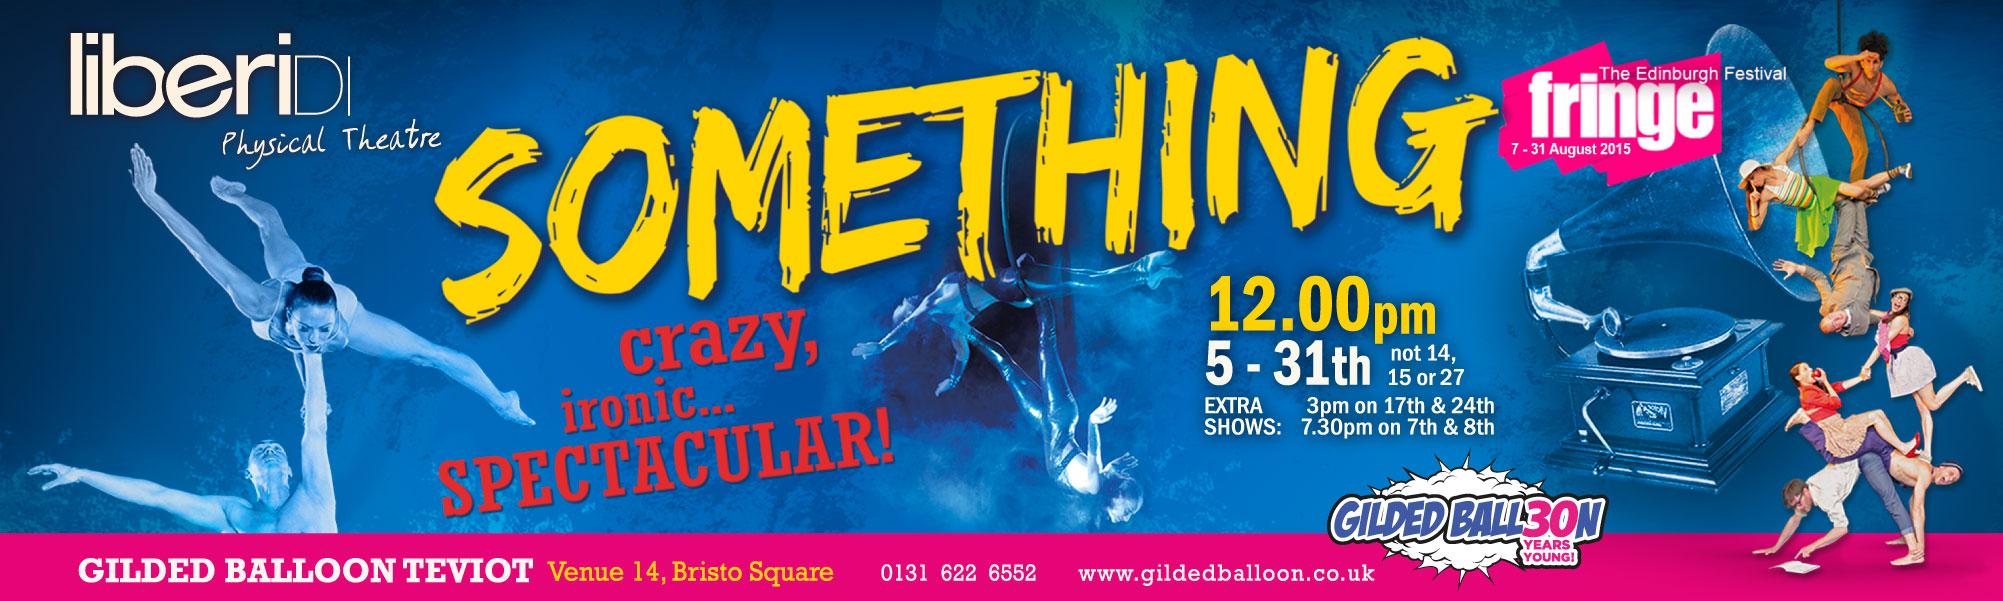 Al Fringe Festival di Edimburgo i Liberi Di... presentano SOMETHING